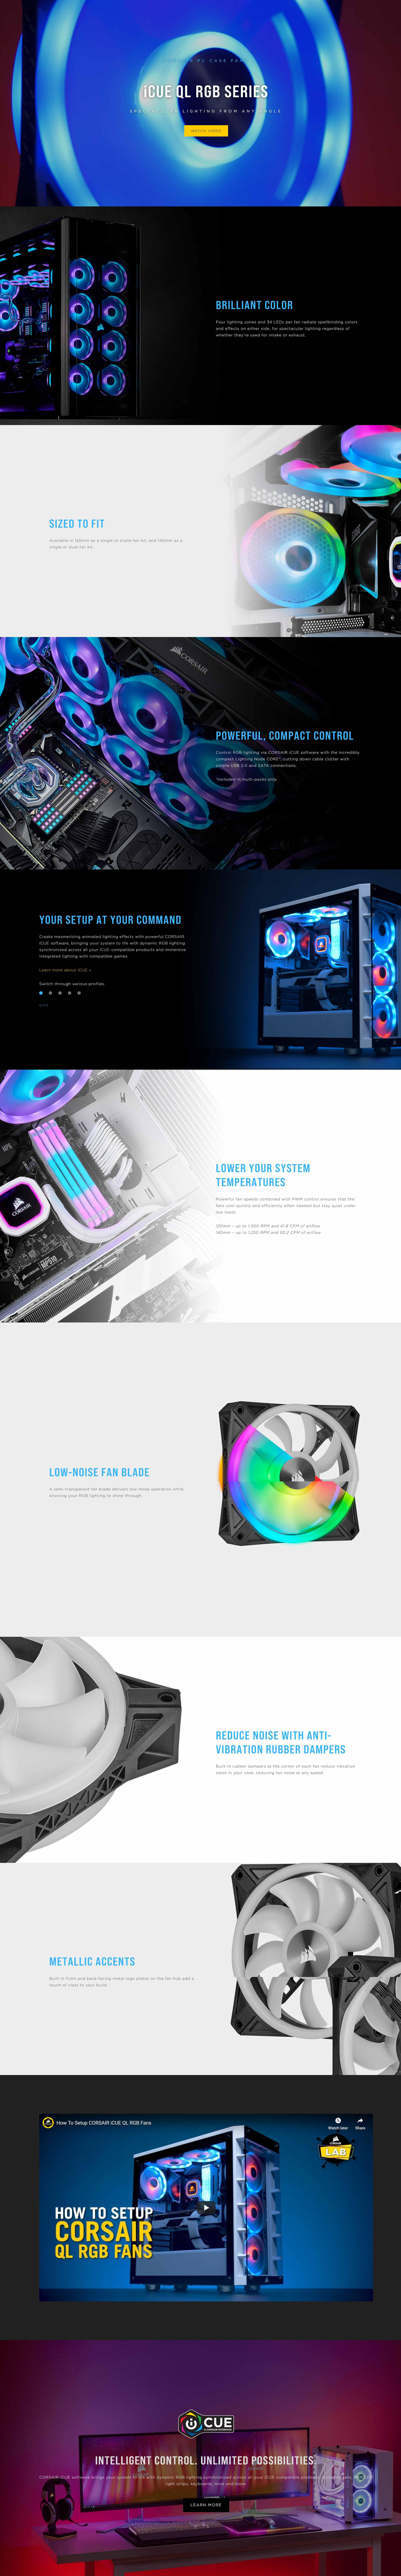 screencapture-corsair-ww-en-Categories-Products-Fans-RGB-LED-Fans-iCUE-QL-RGB-PWM-Fan-p-CO-9050098-WW-2020-04-27-18_11_48.jpg